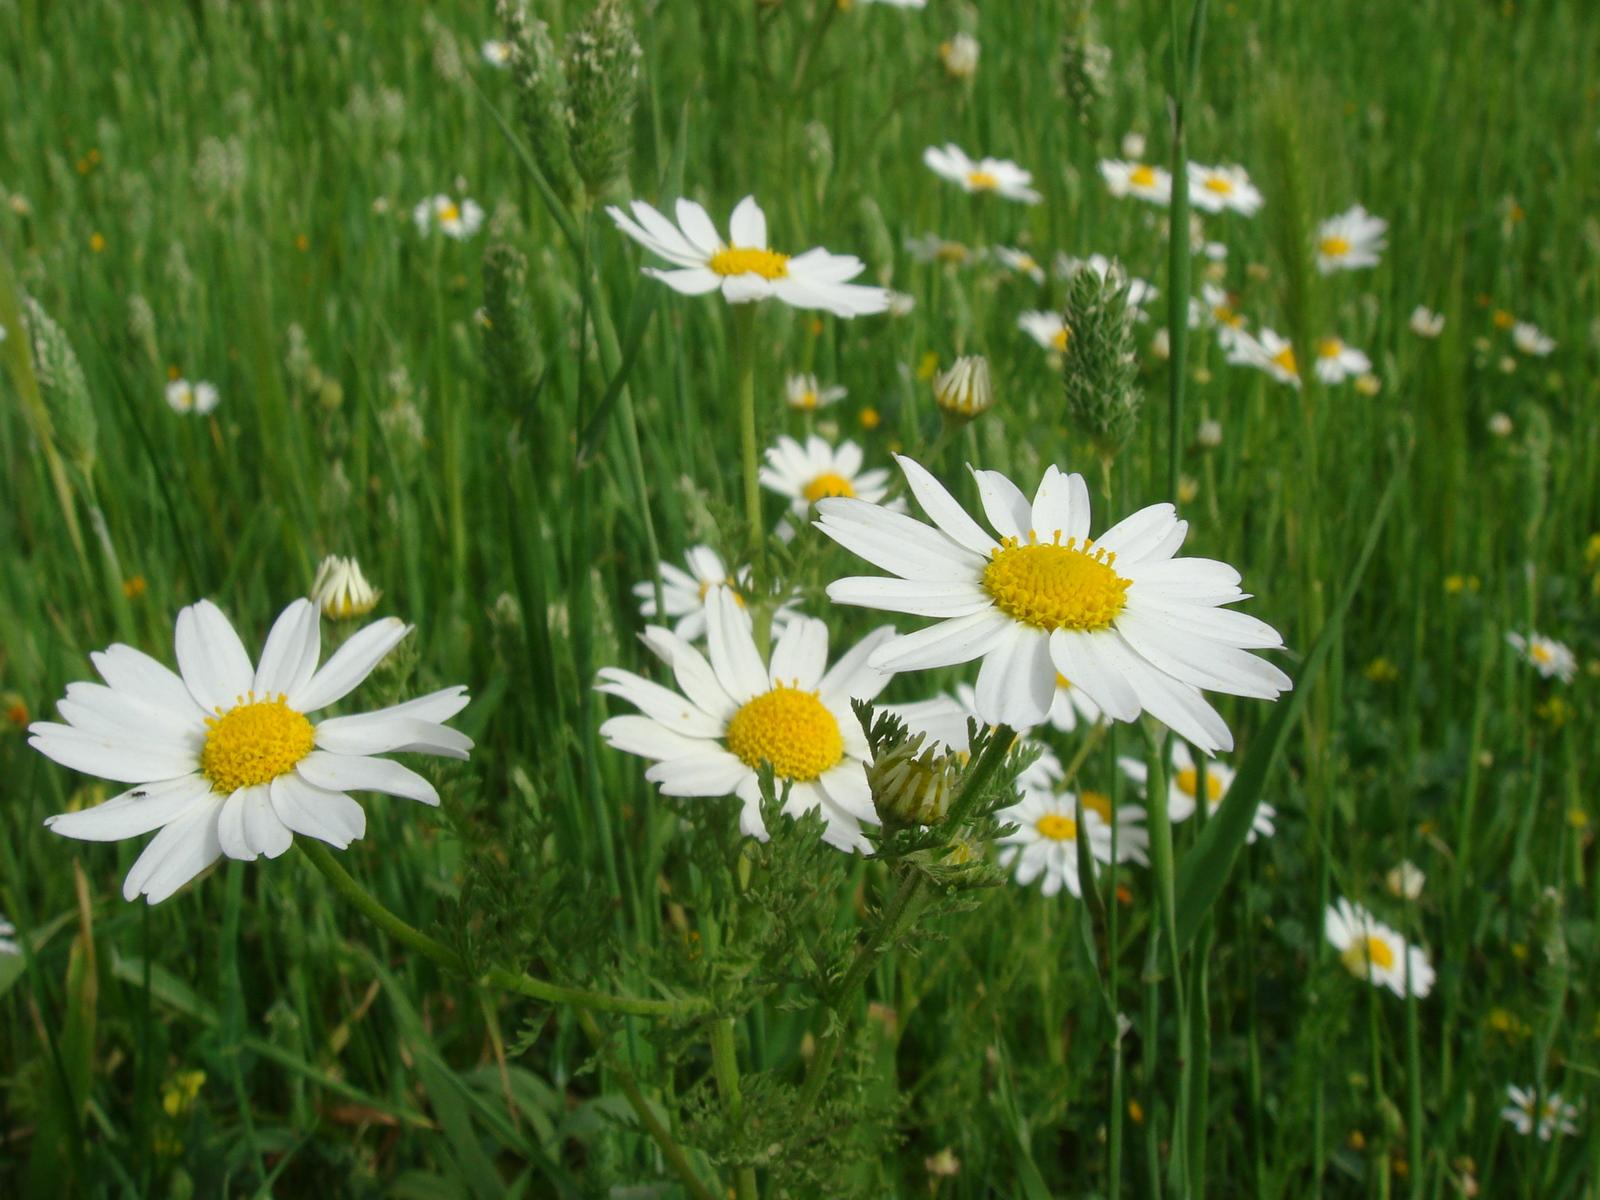 http://3.bp.blogspot.com/-wg5GZSoJJ9k/T6O75ZXHzaI/AAAAAAAAARU/Pb3yZlIYsQc/s1600/spring-flowers-wallpapers_5423_1600.jpg